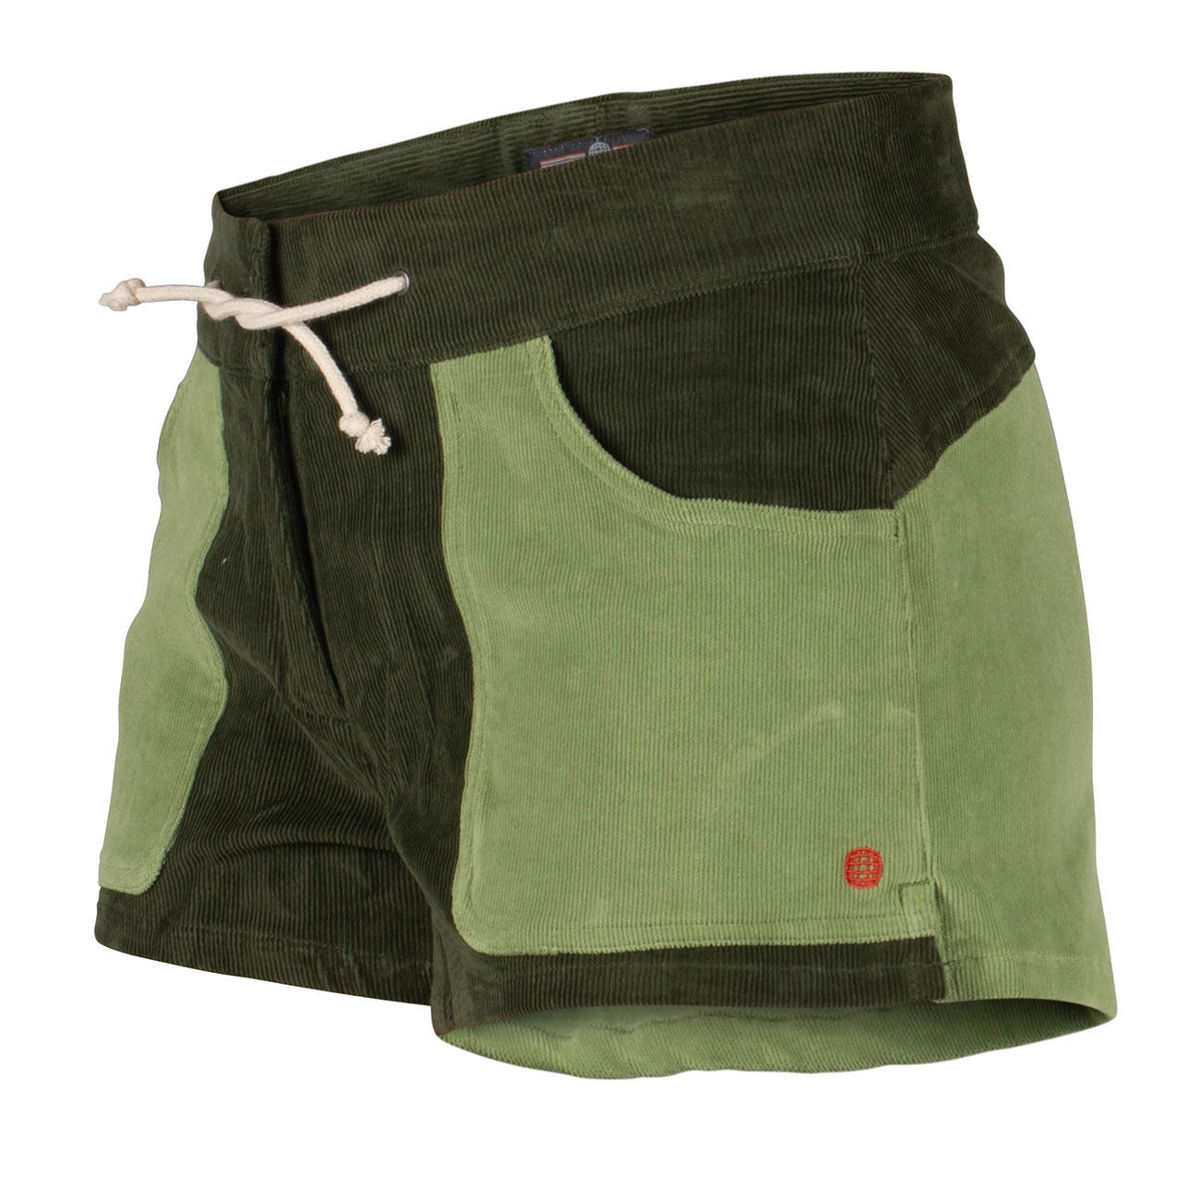 Bilde av Amundsen 3incher Concord shorts womens Olive/Moss Green WSS51.2.450